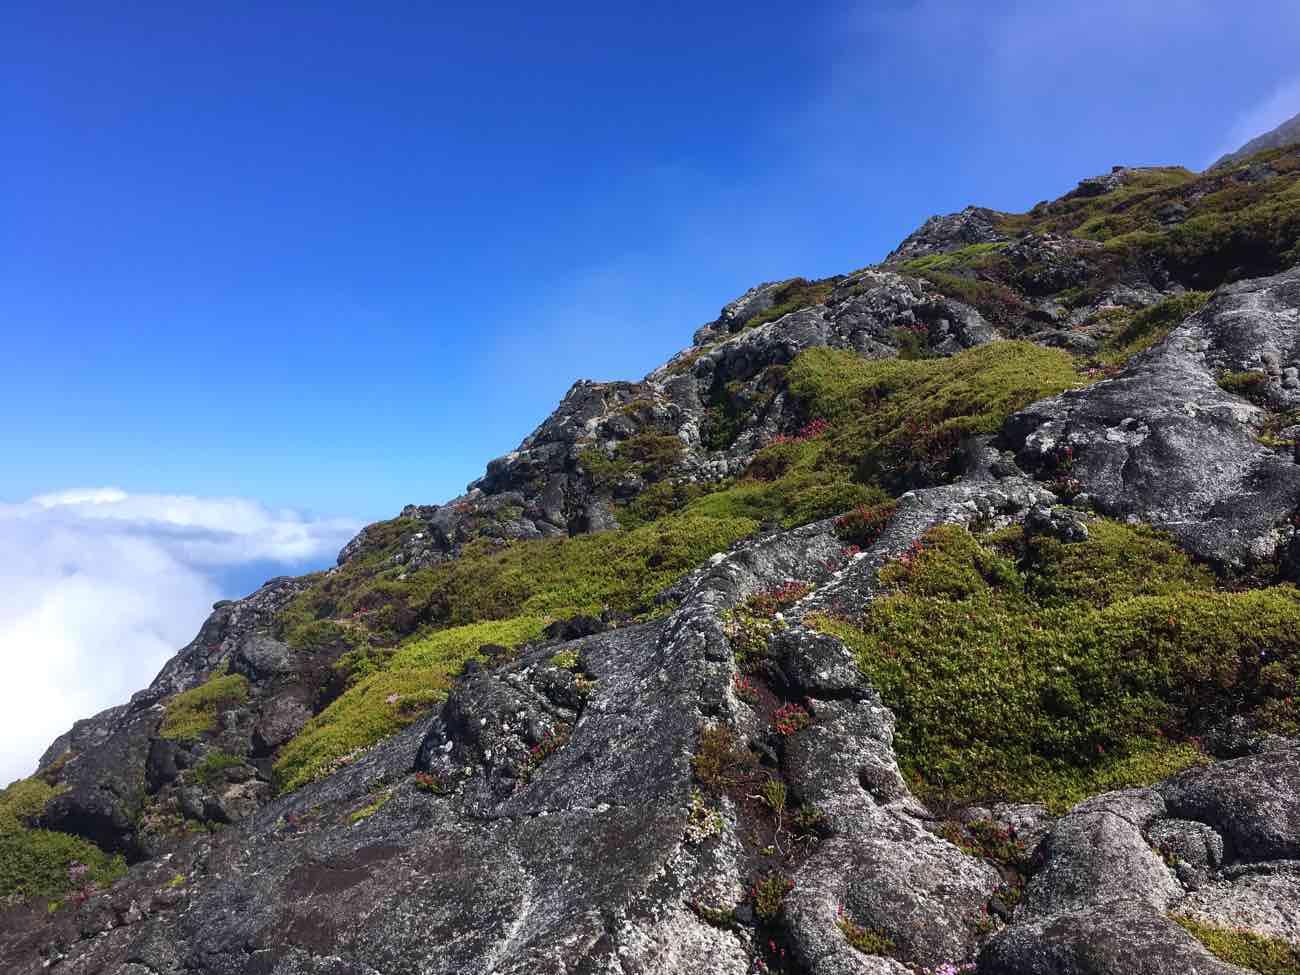 mount pico mountain azores climb landscape